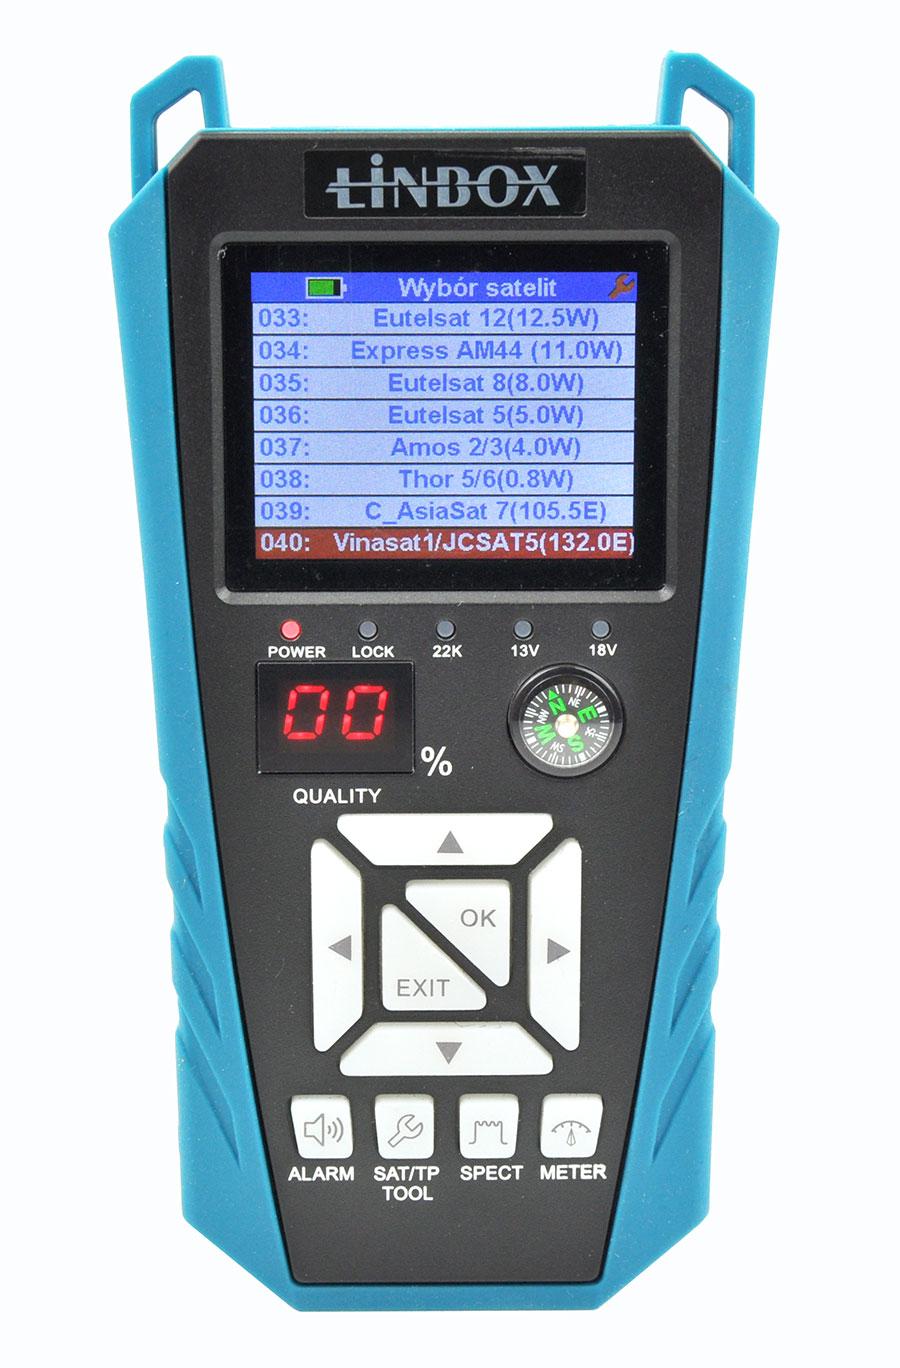 Miernik Linbox WS-6934 dla DVB-S/S2